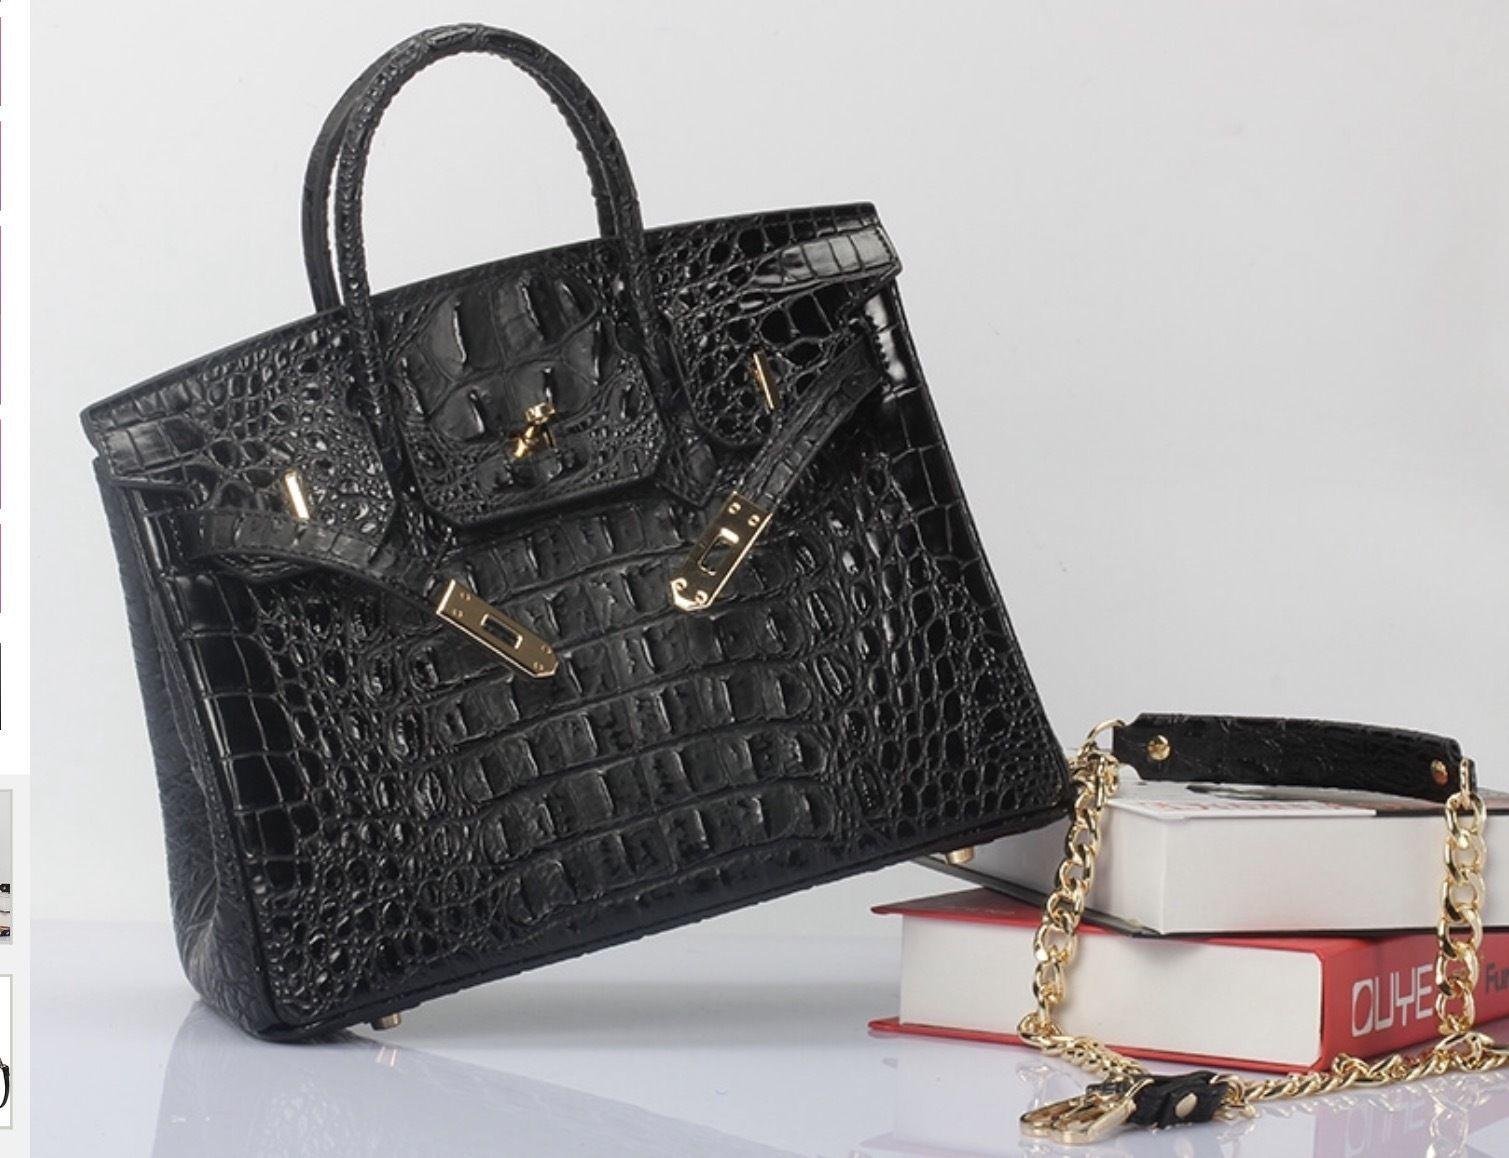 Crocodile Embossed Italian Leather Birkin Style Croc Satchel Handbag 1633S